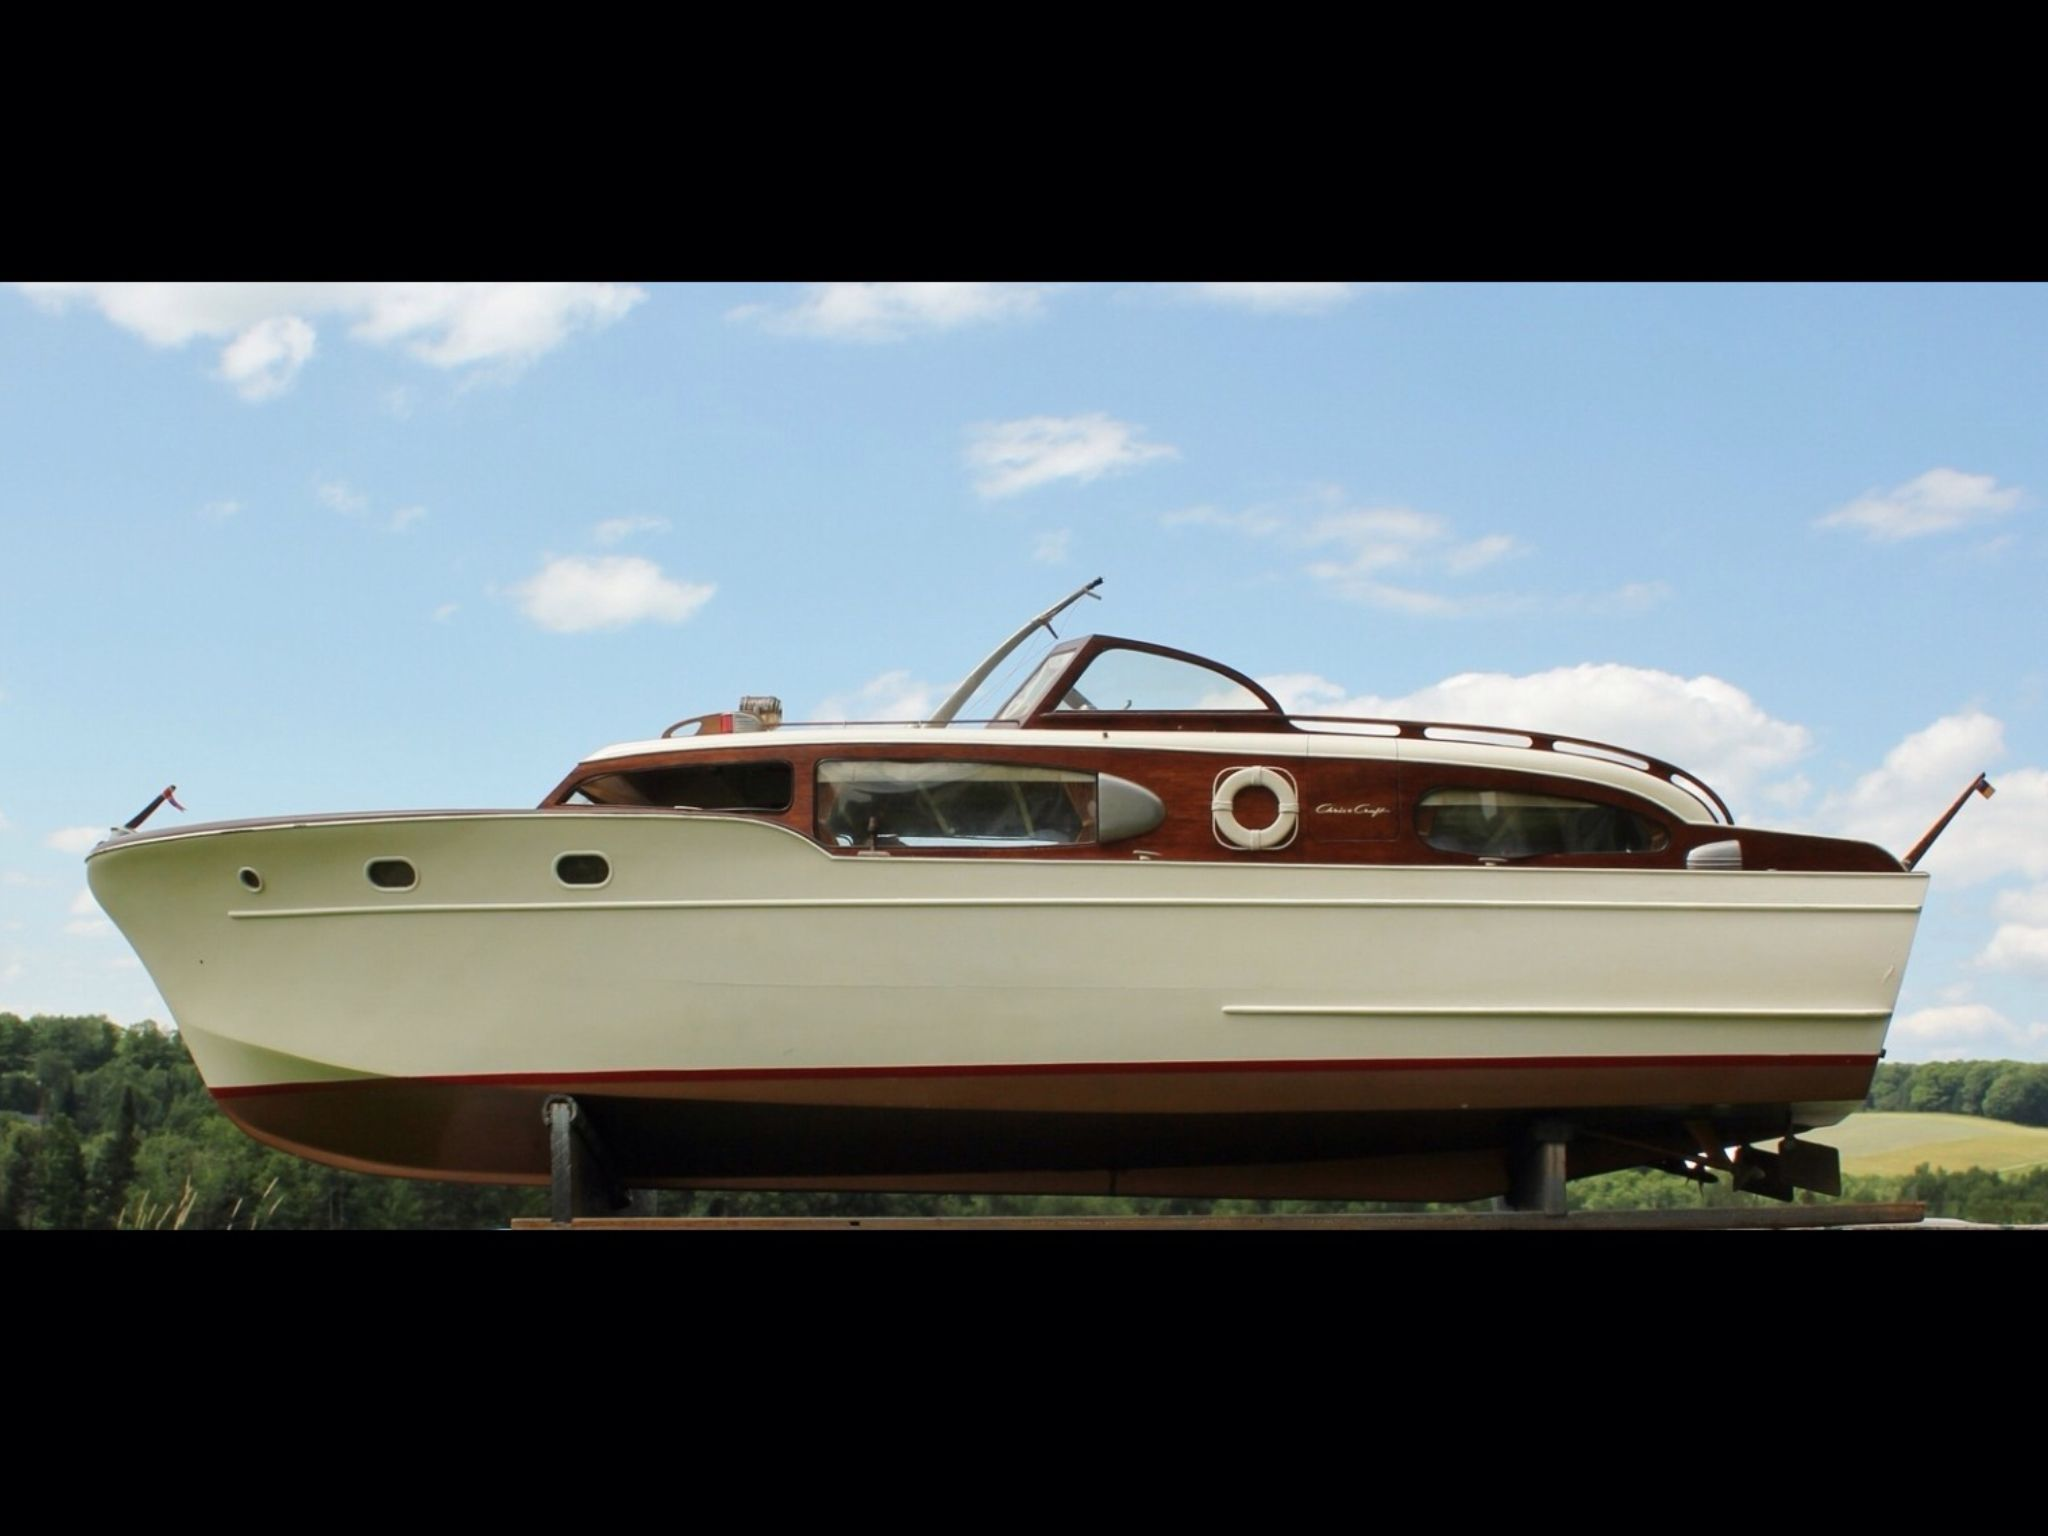 Sterling model RC wood boat Chris Craft Corvette   RC Models   Pinterest   Wood boats, Chris ...